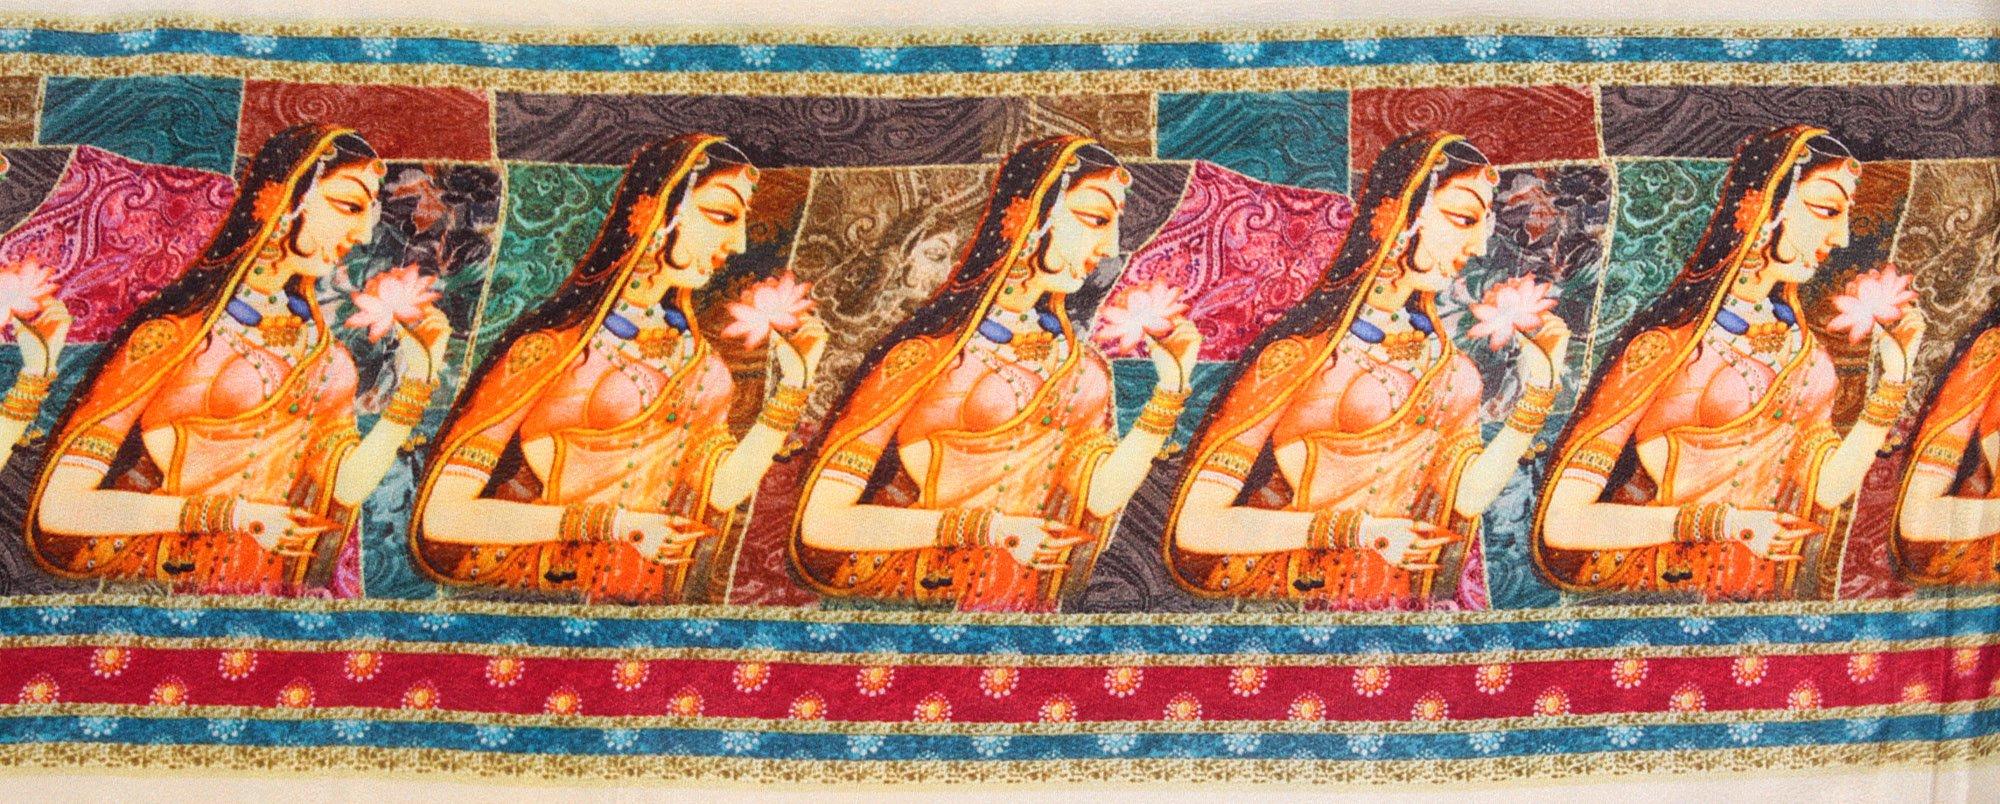 Lady With Flower Digital Printed Fabric Border